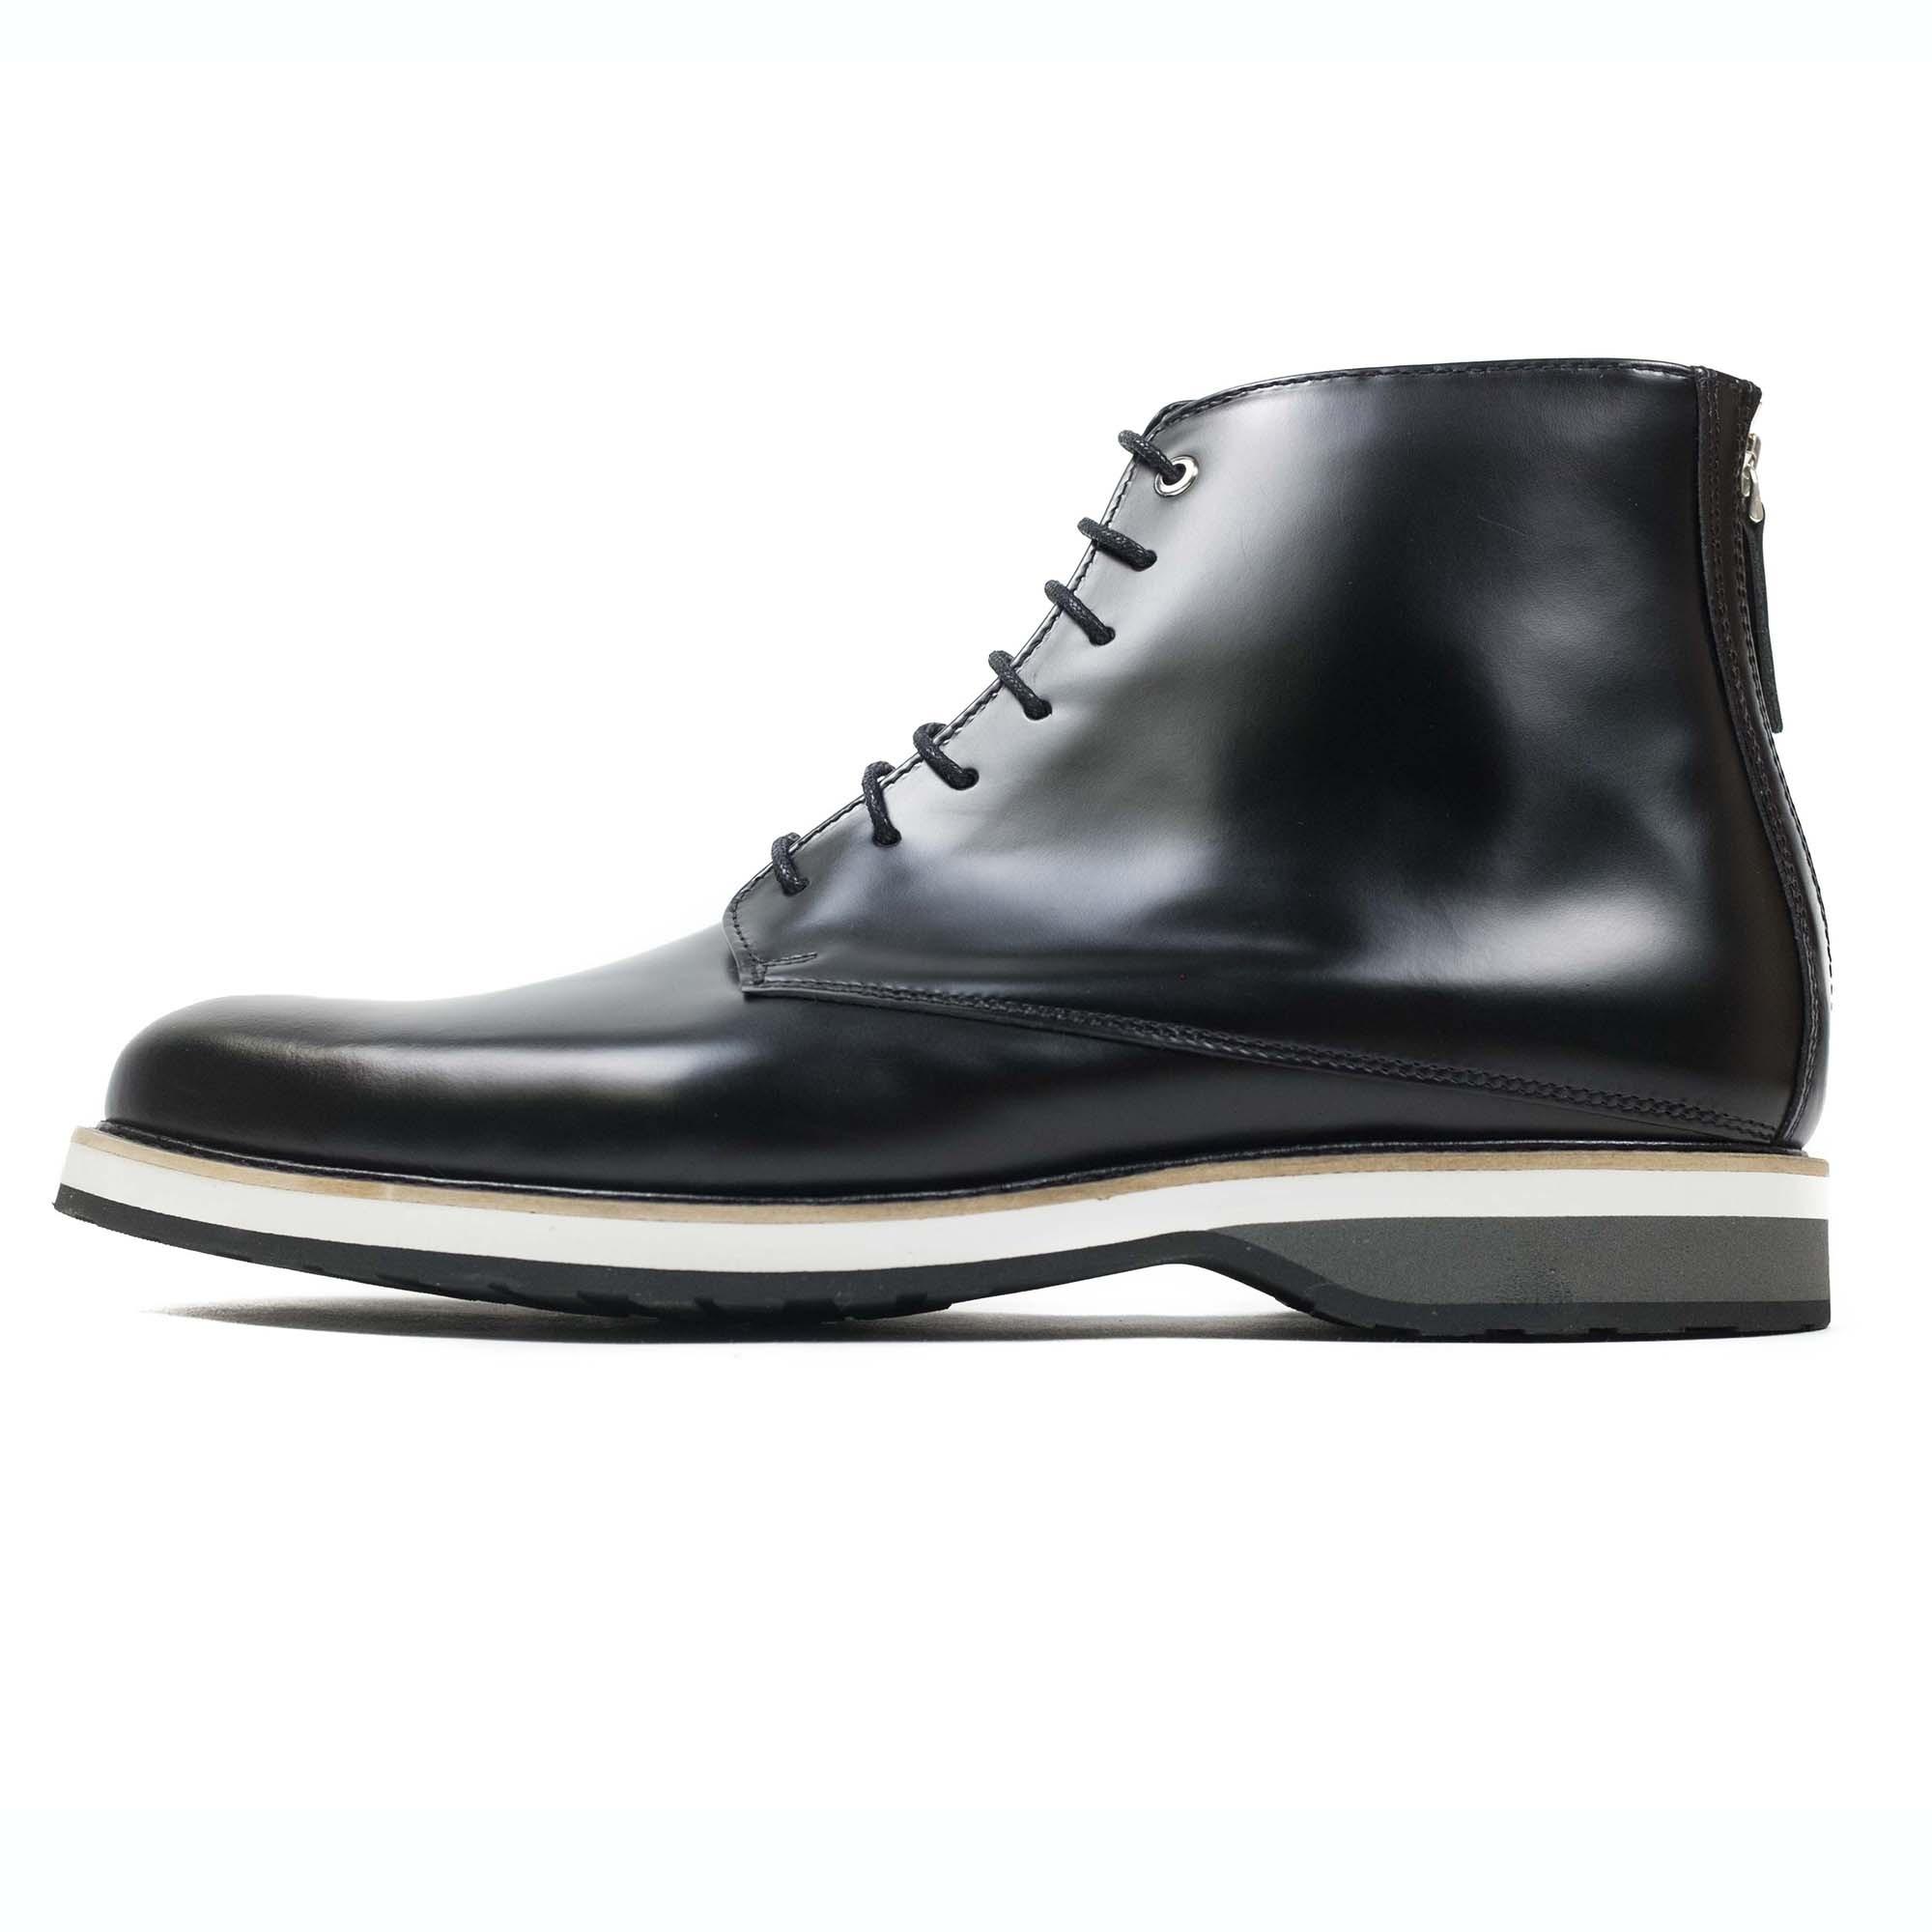 WANT Les Essentiels Montoro High Derby Boot - Black